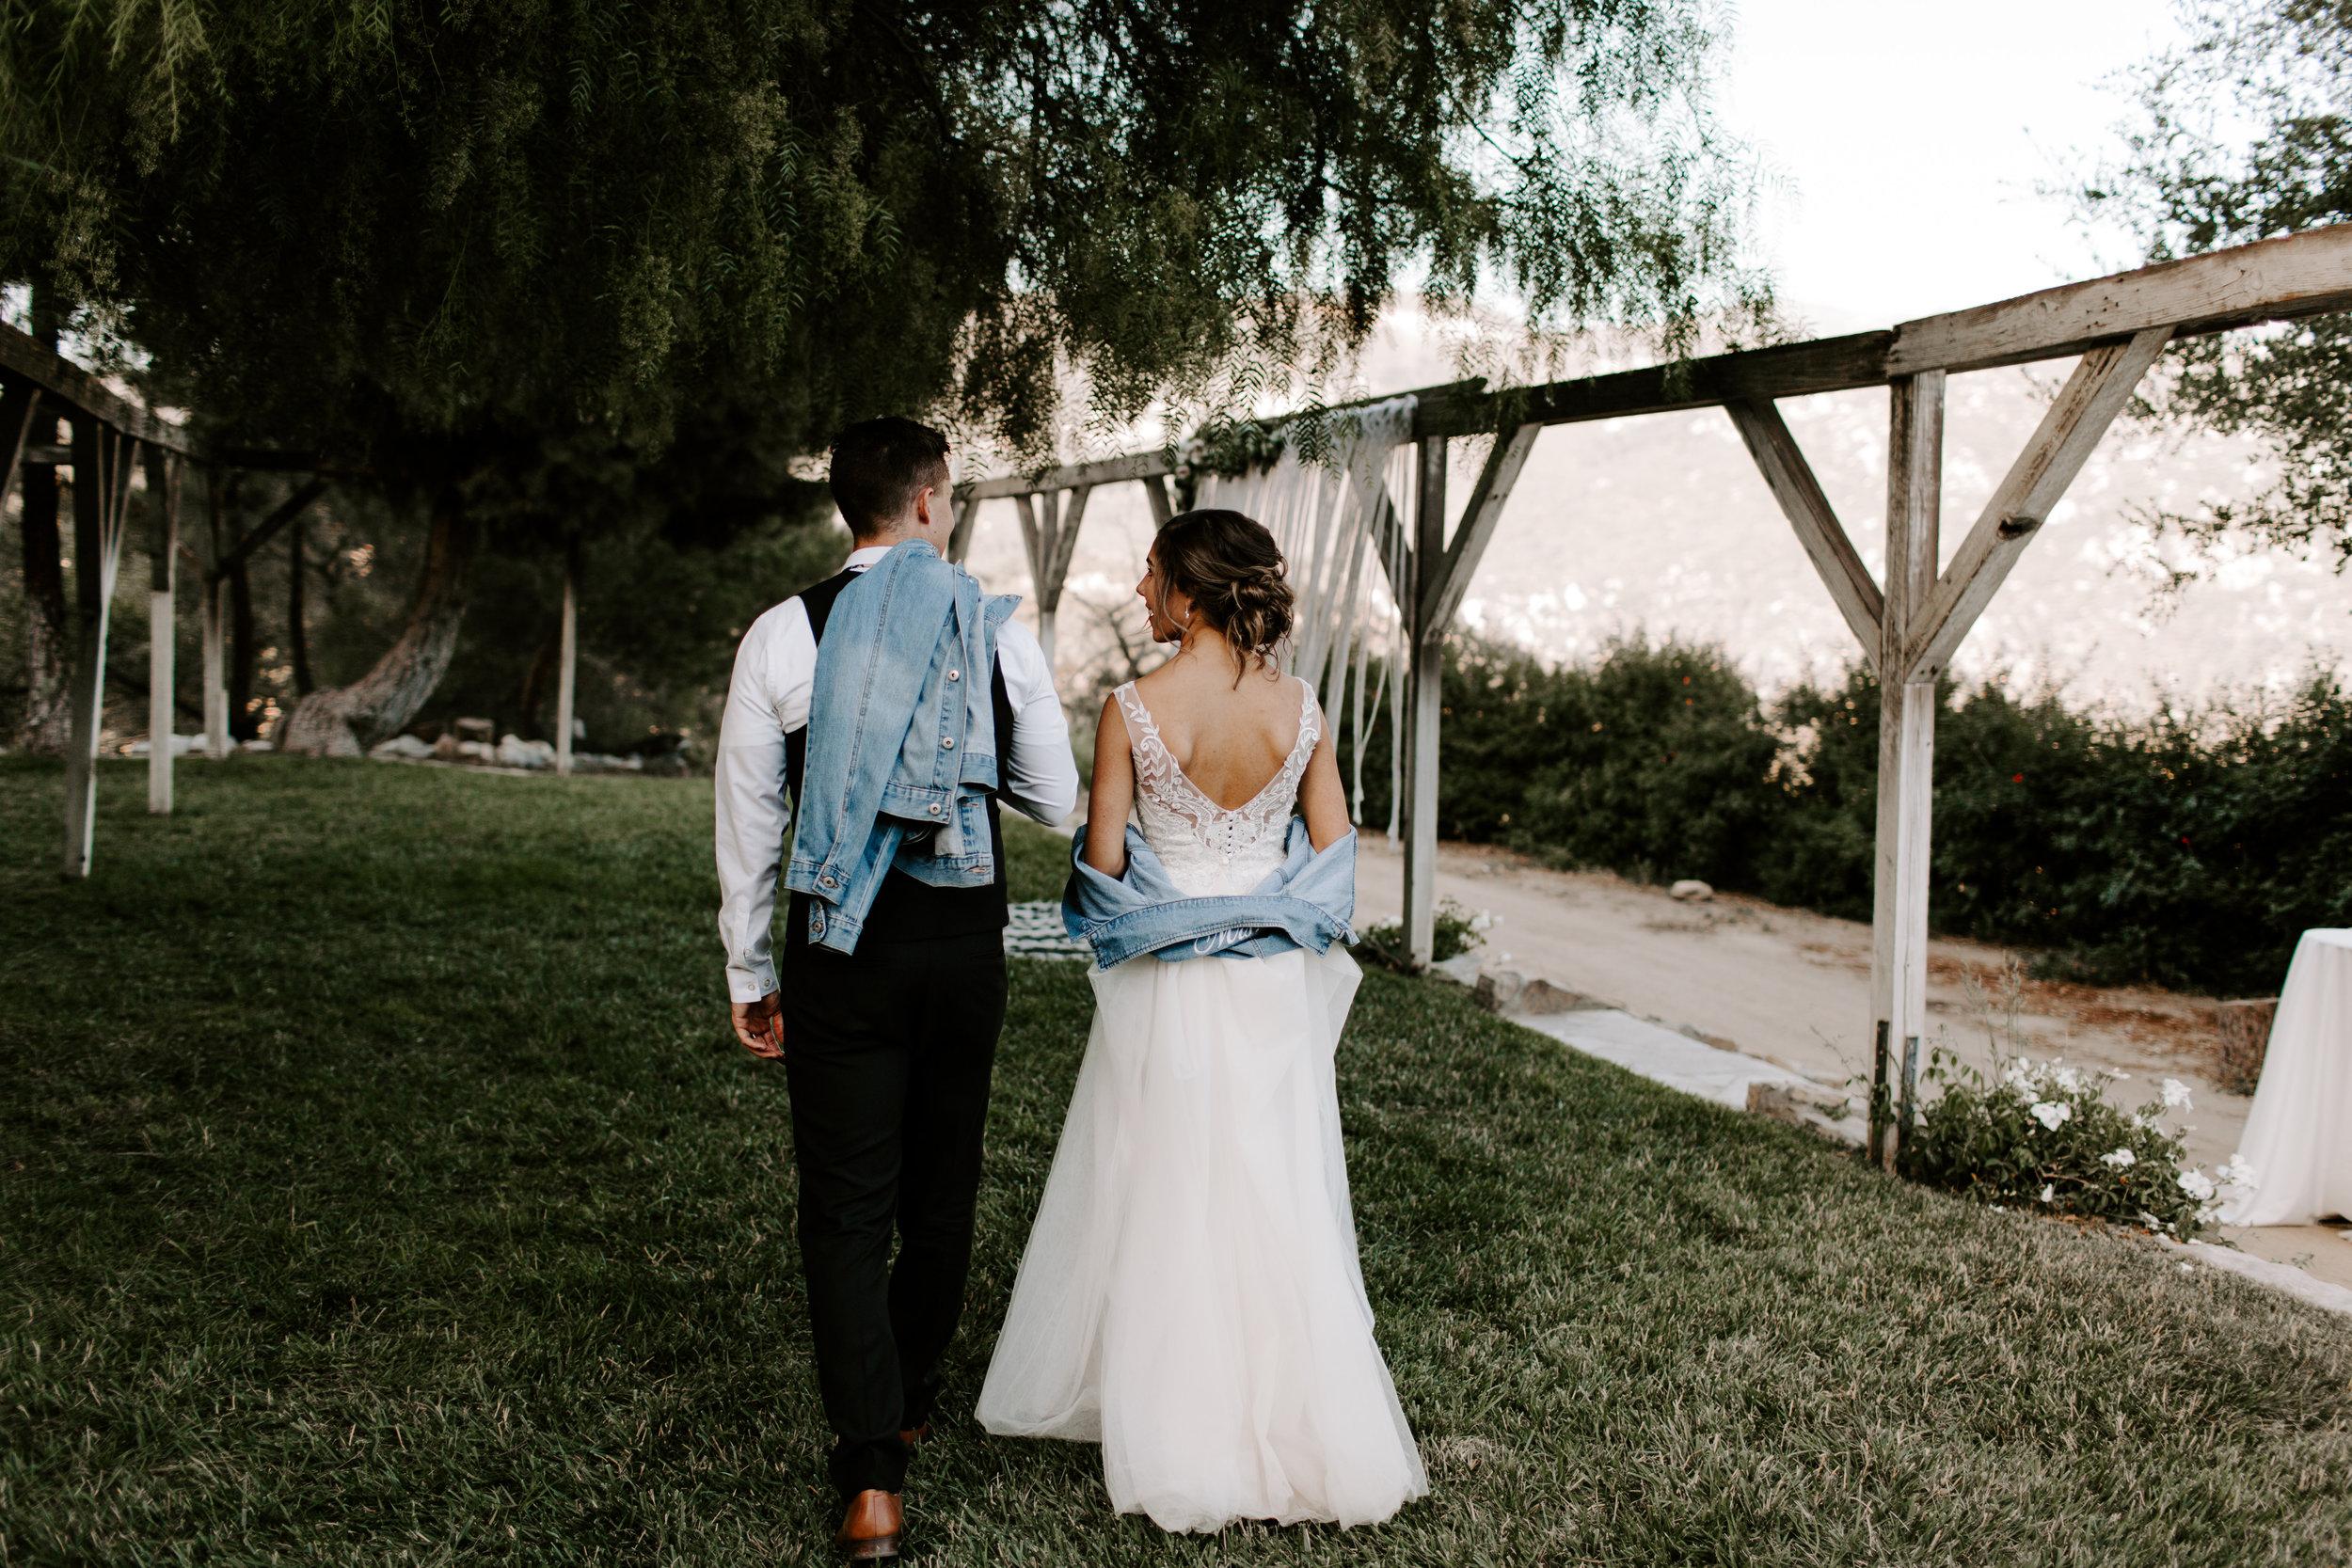 kate+zack_wedding_secludedgardenestate_temecula_madisonrylee_0773.jpg